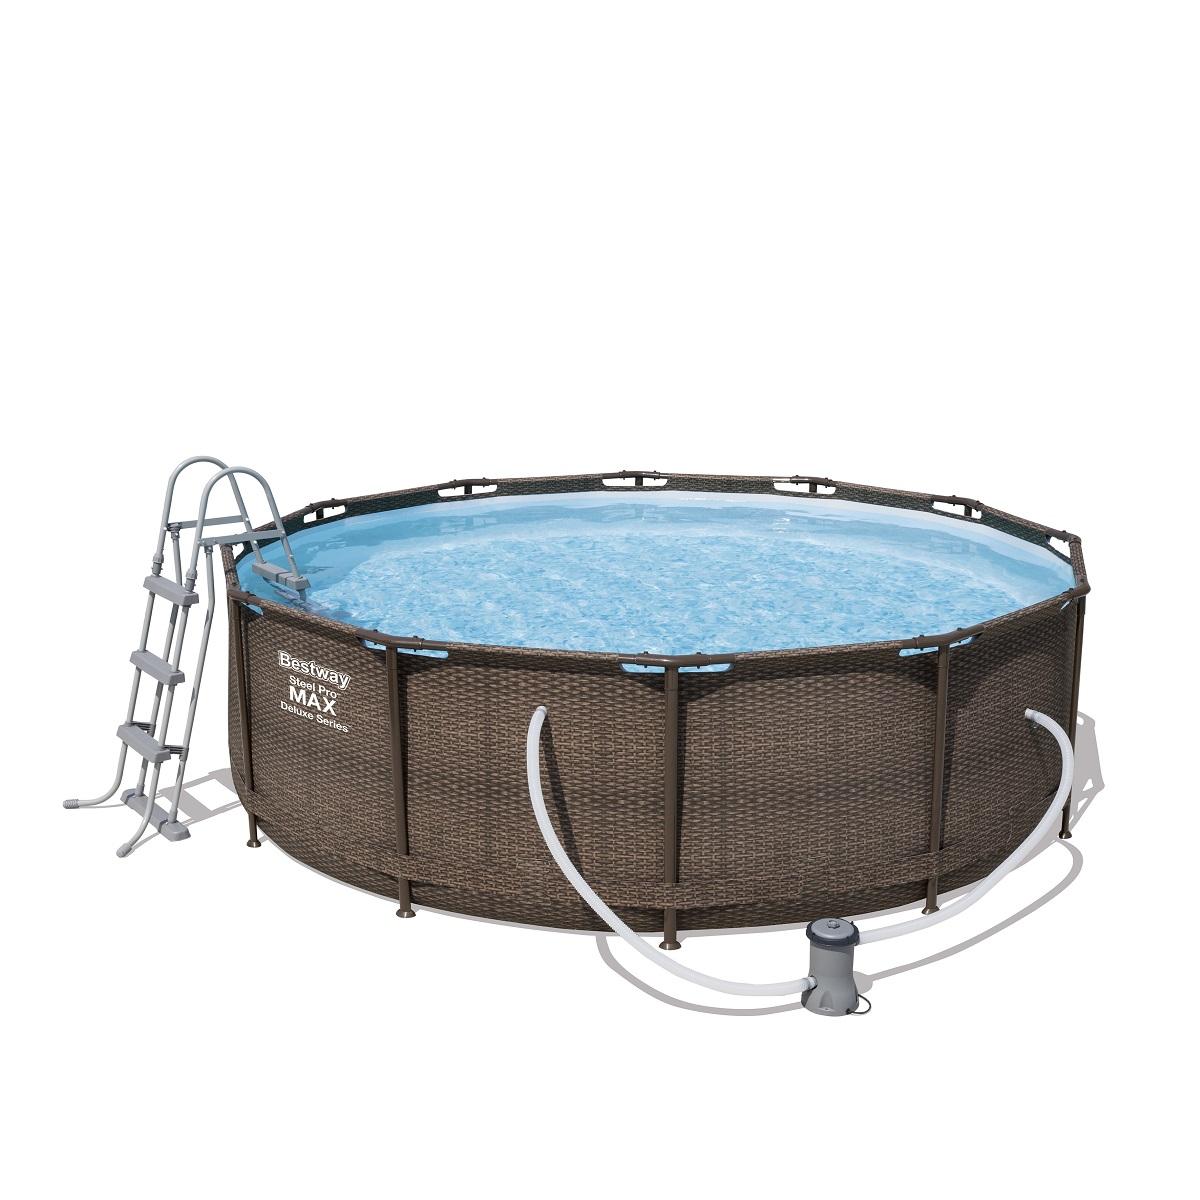 Bazén Steel Pro Max Deluxe 366 x 100 cm set s kartušovou filtráciou - hnedý